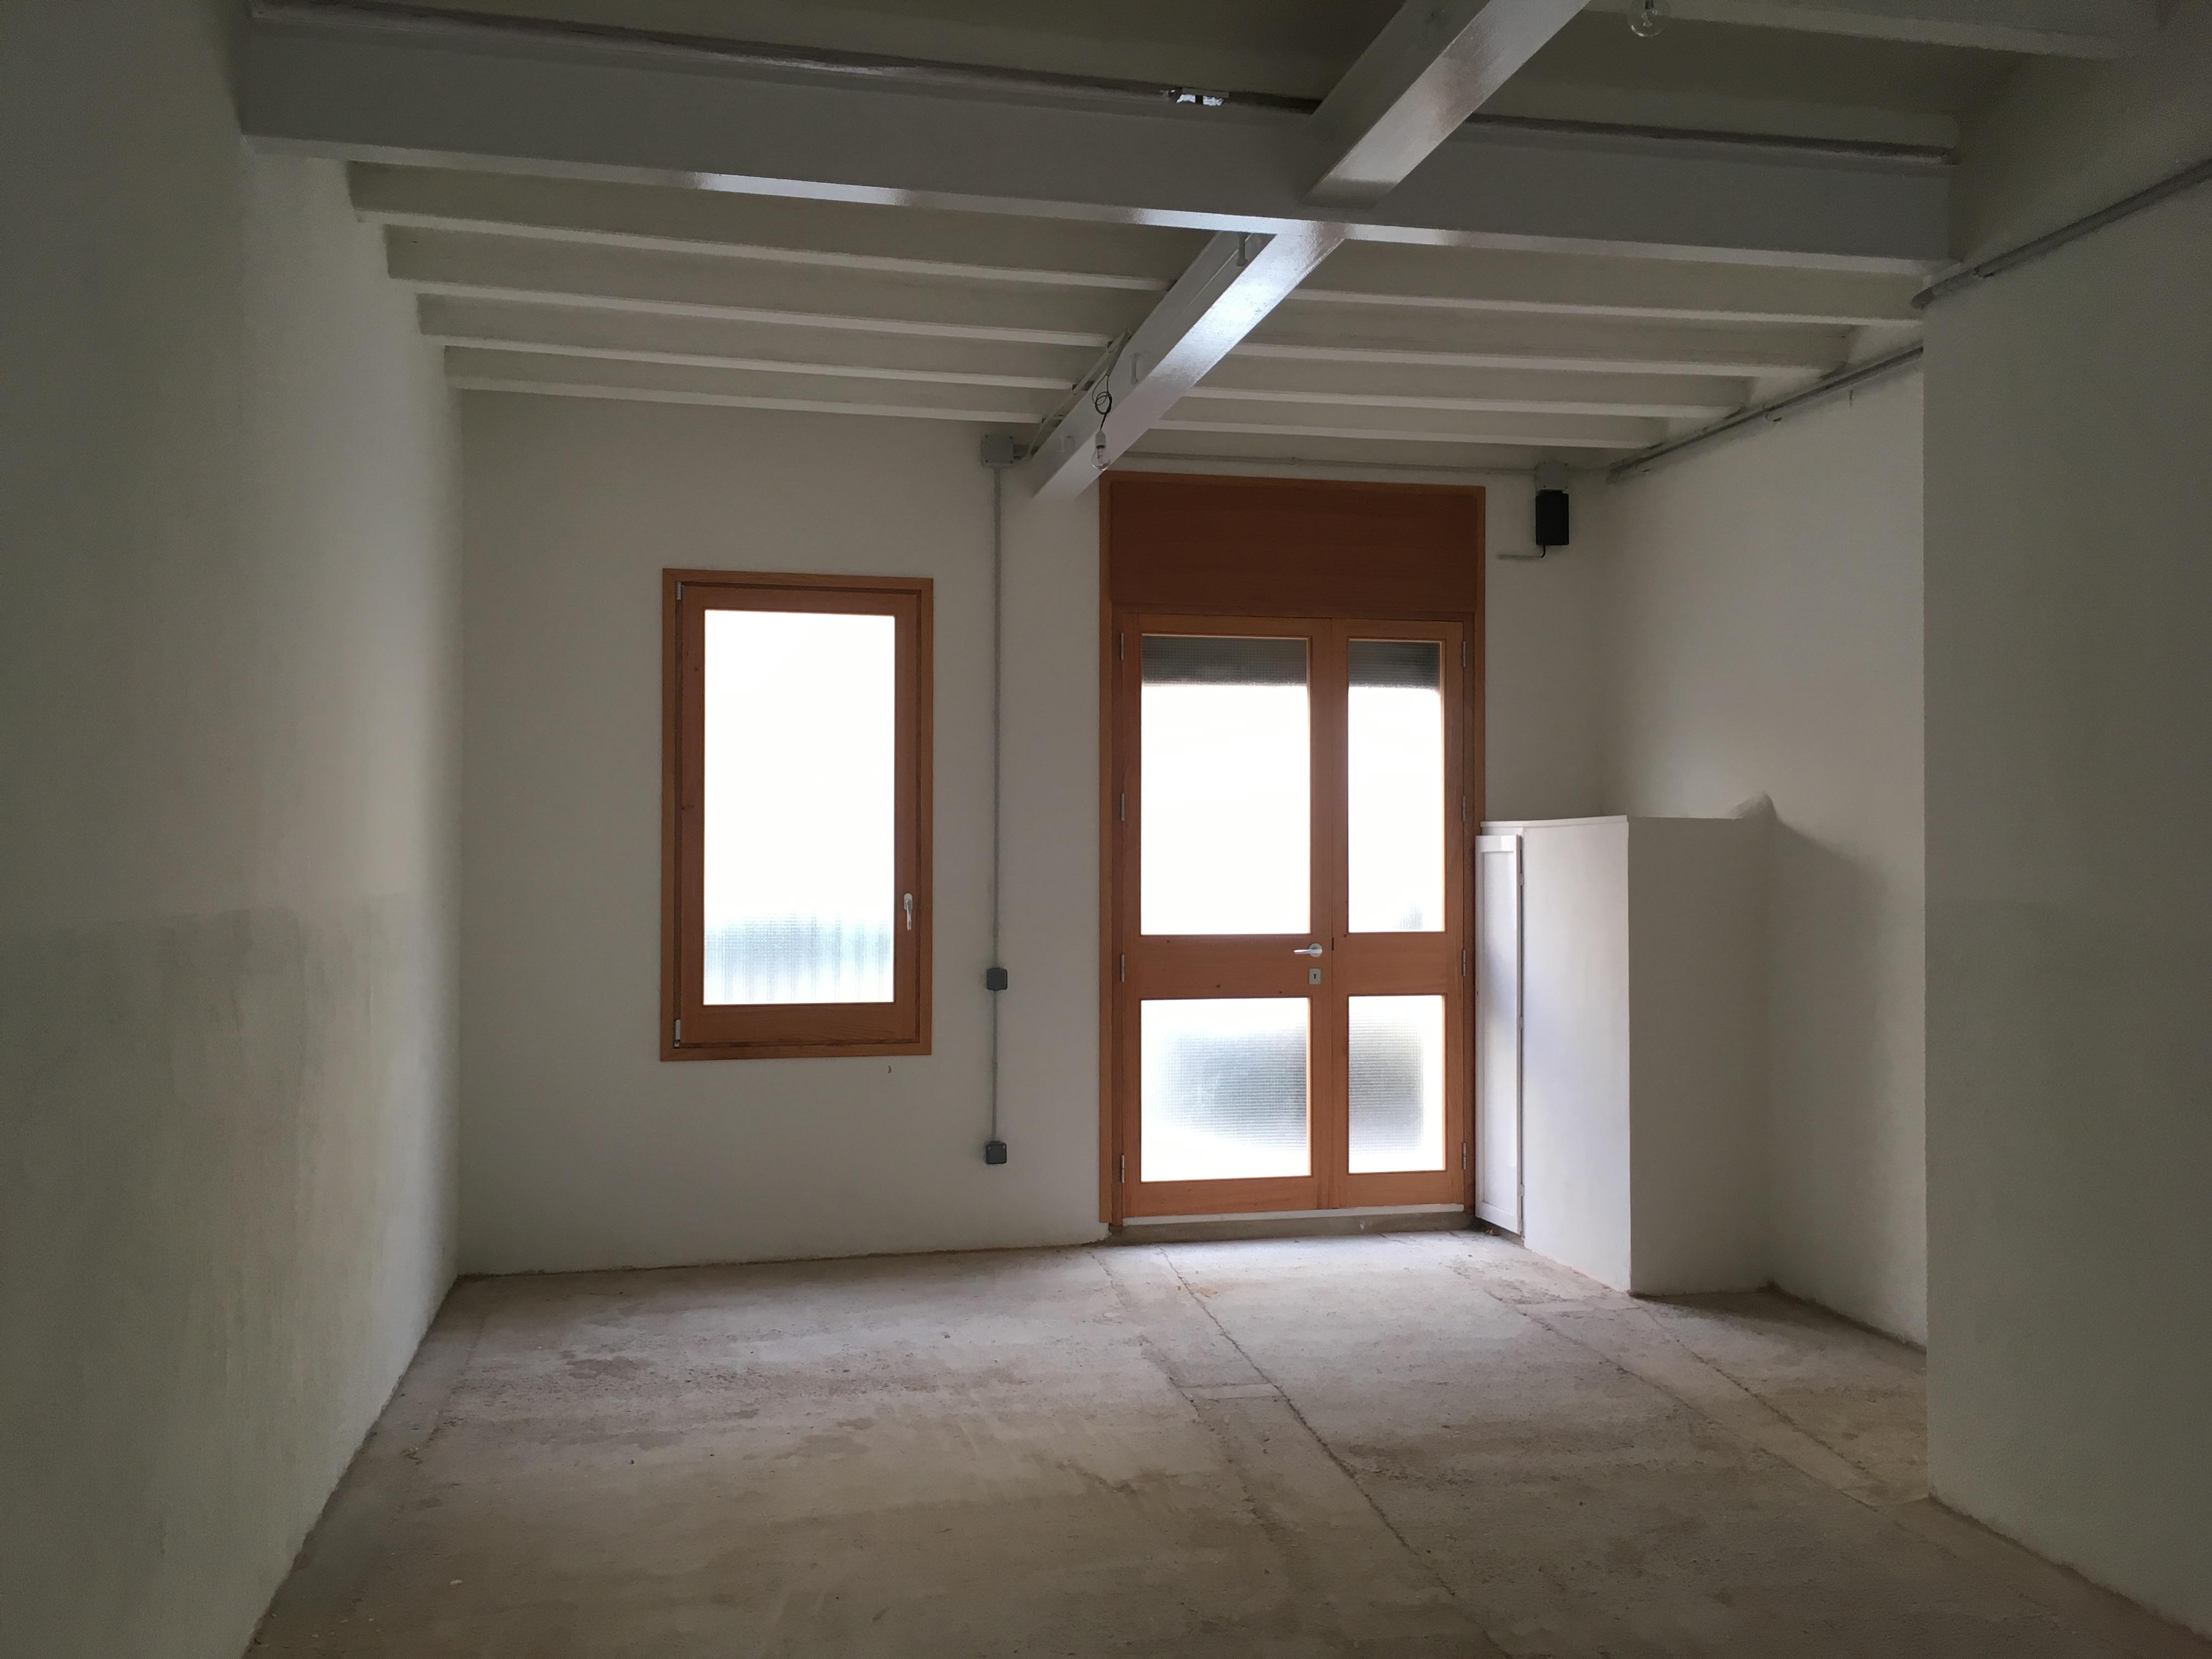 Reforma habitatge planta baixa